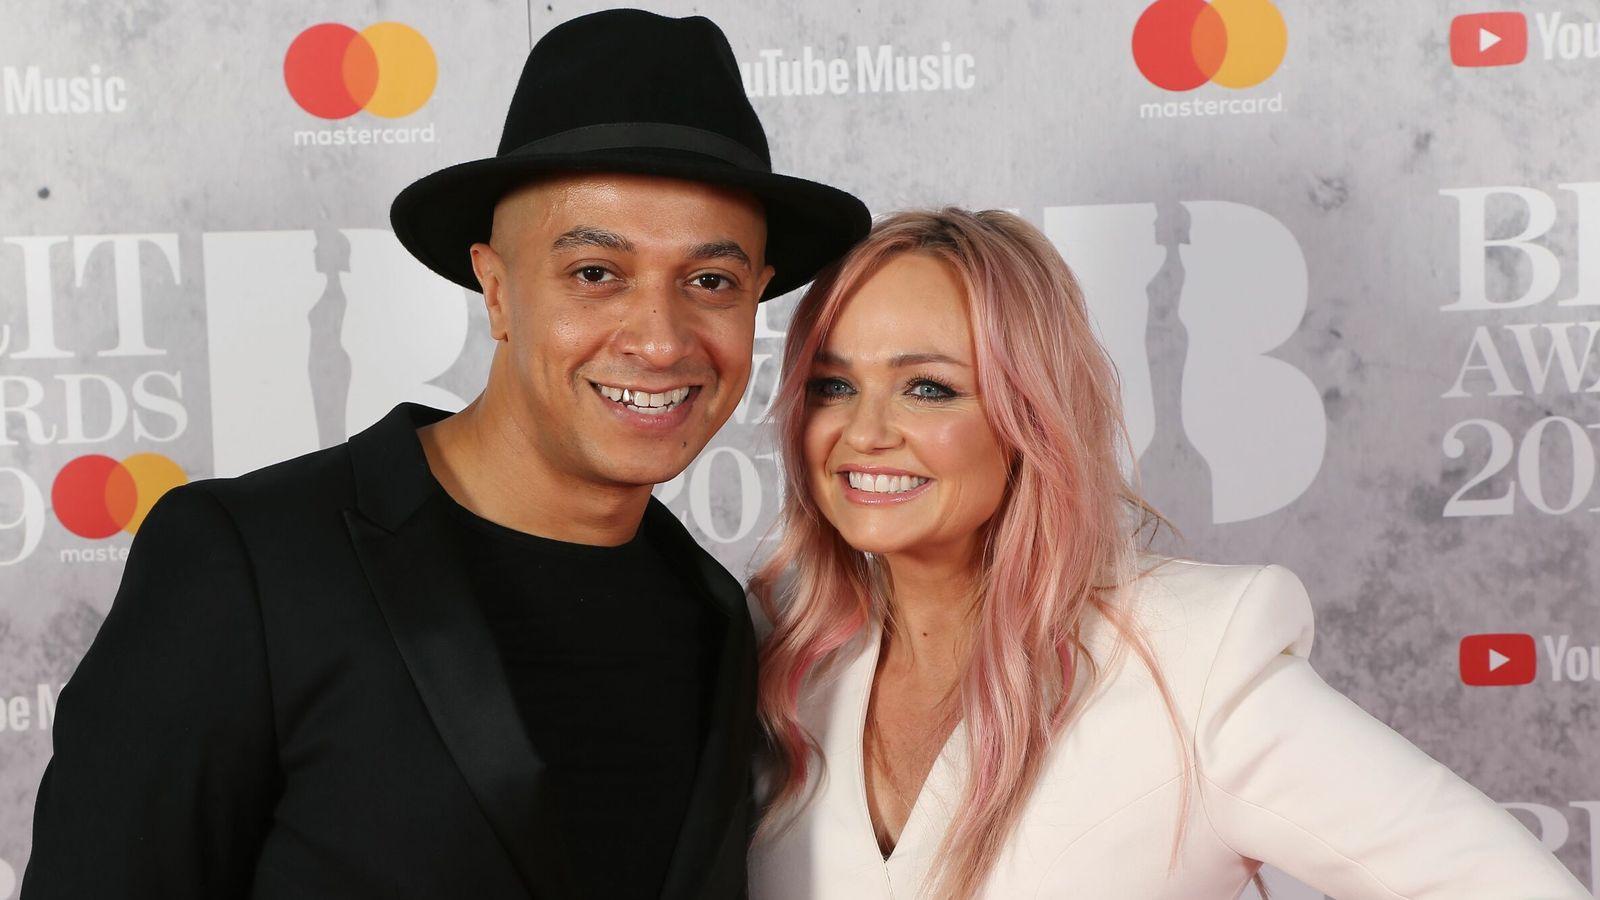 Spice Girls: Emma Bunton marries long-time fiance Jade Jones